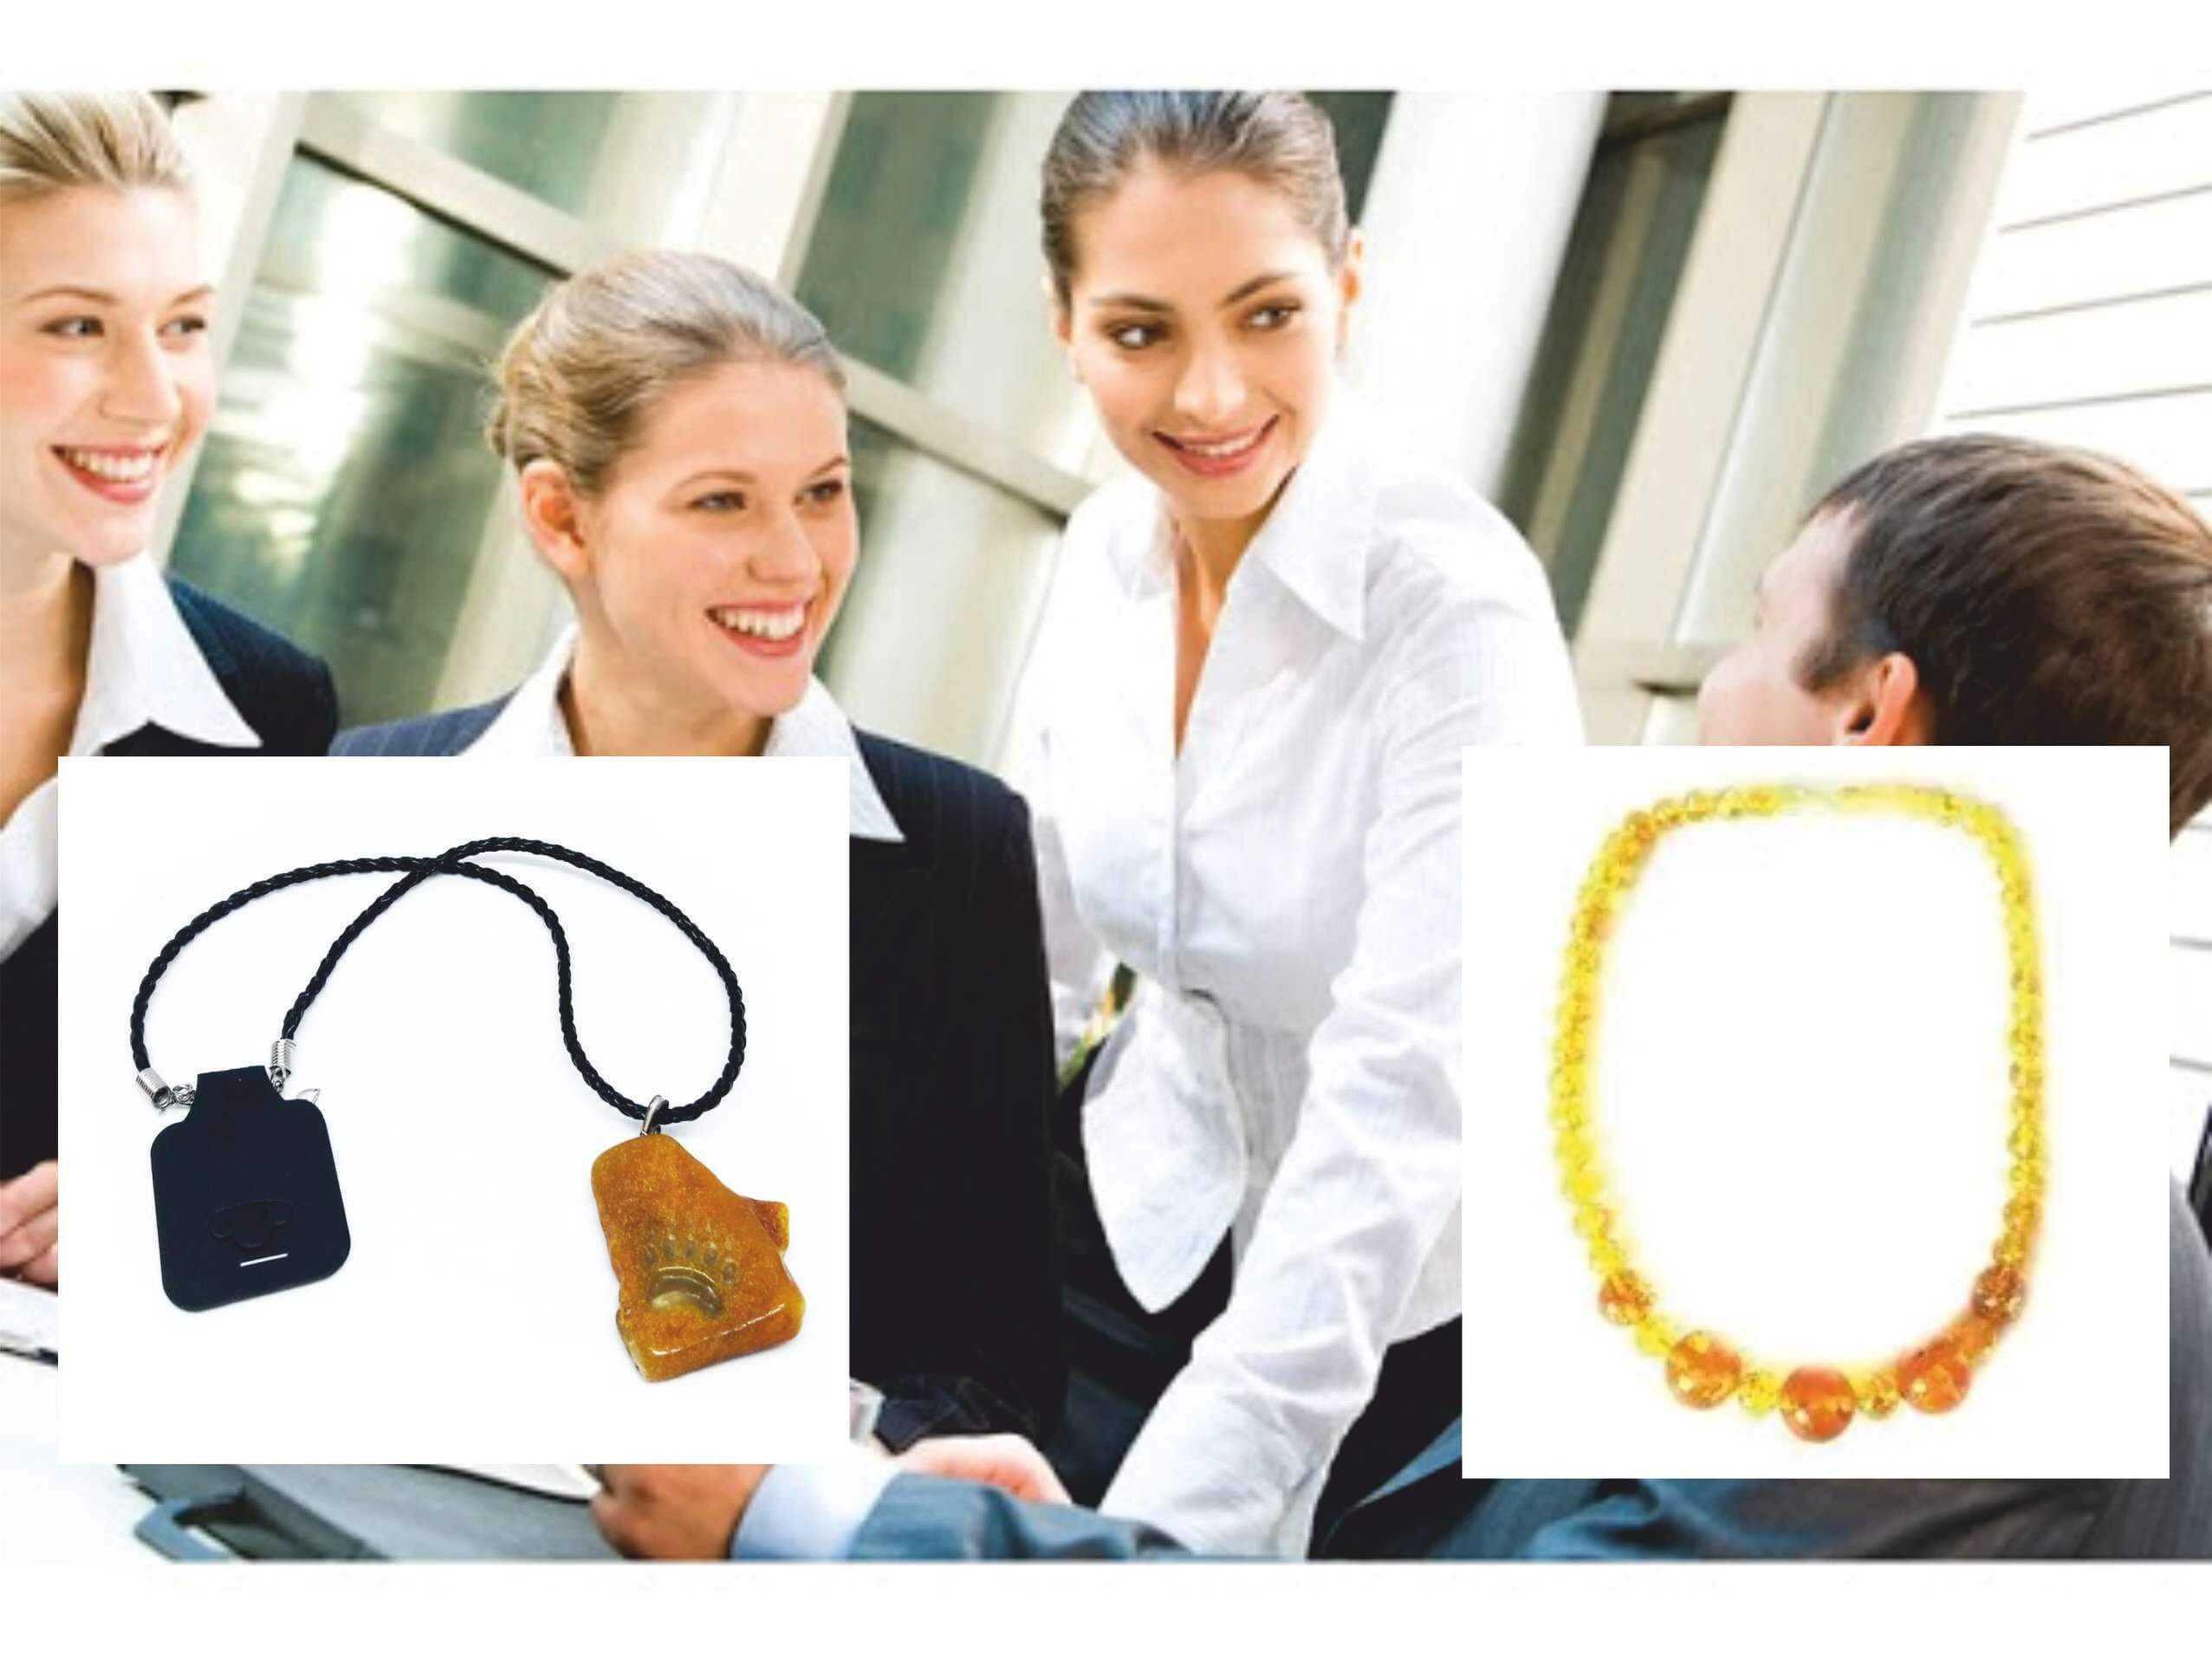 Каким профессиям подходит янтарь?